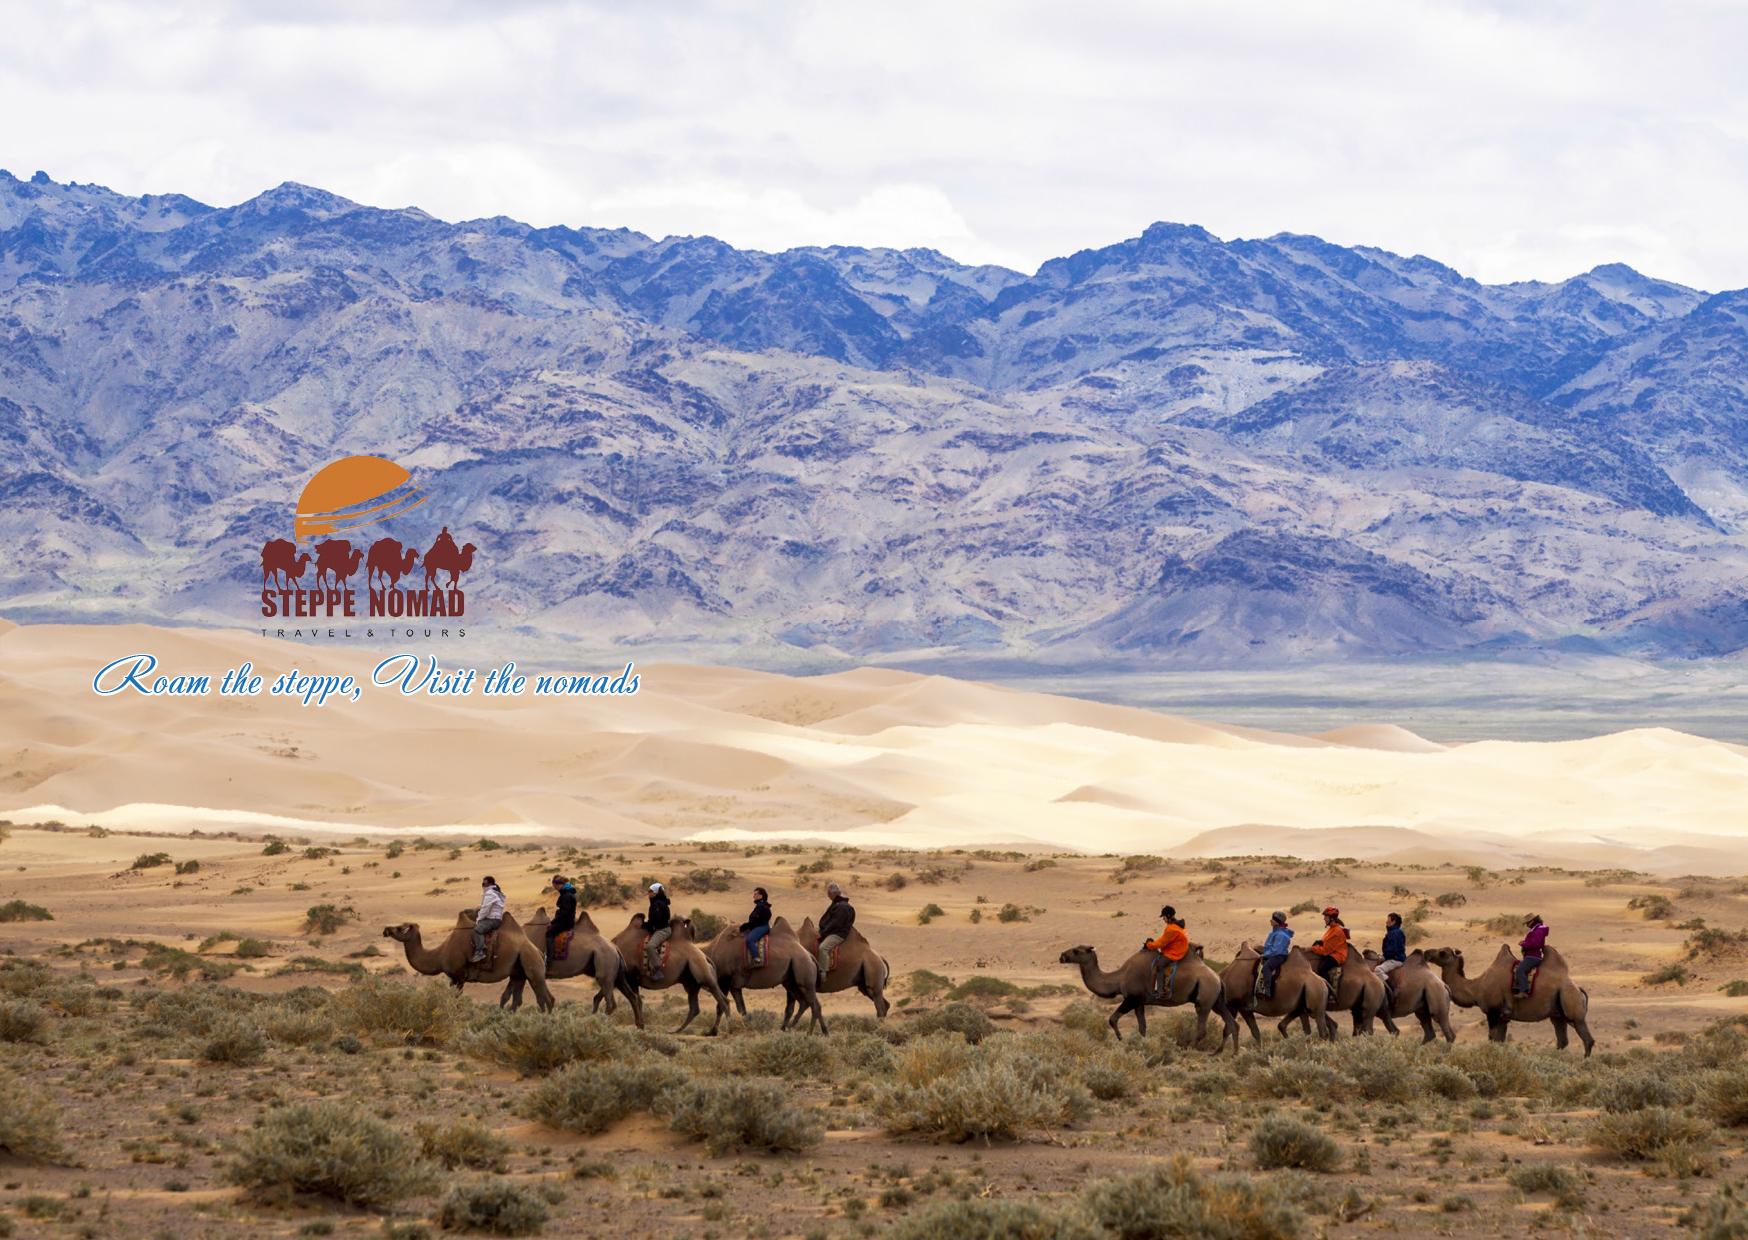 Steppe Nomad Mongolia